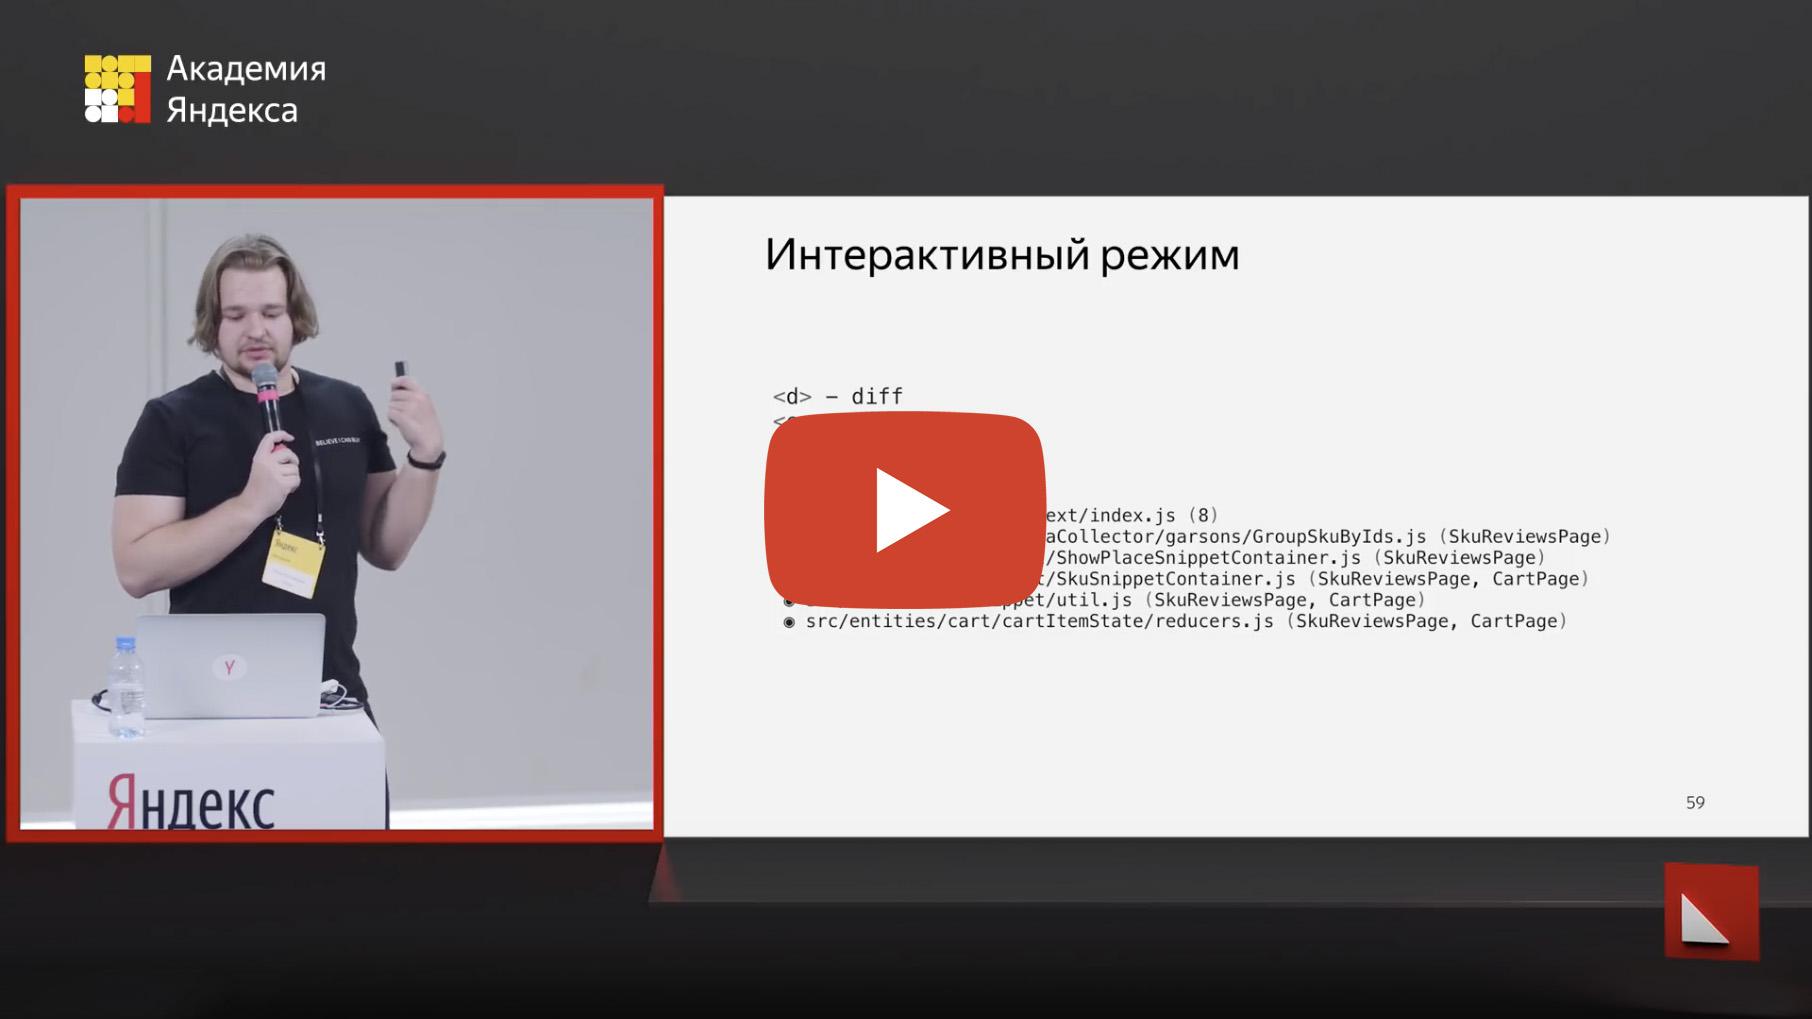 Жизнь до рантайма. Доклад Яндекса - 1